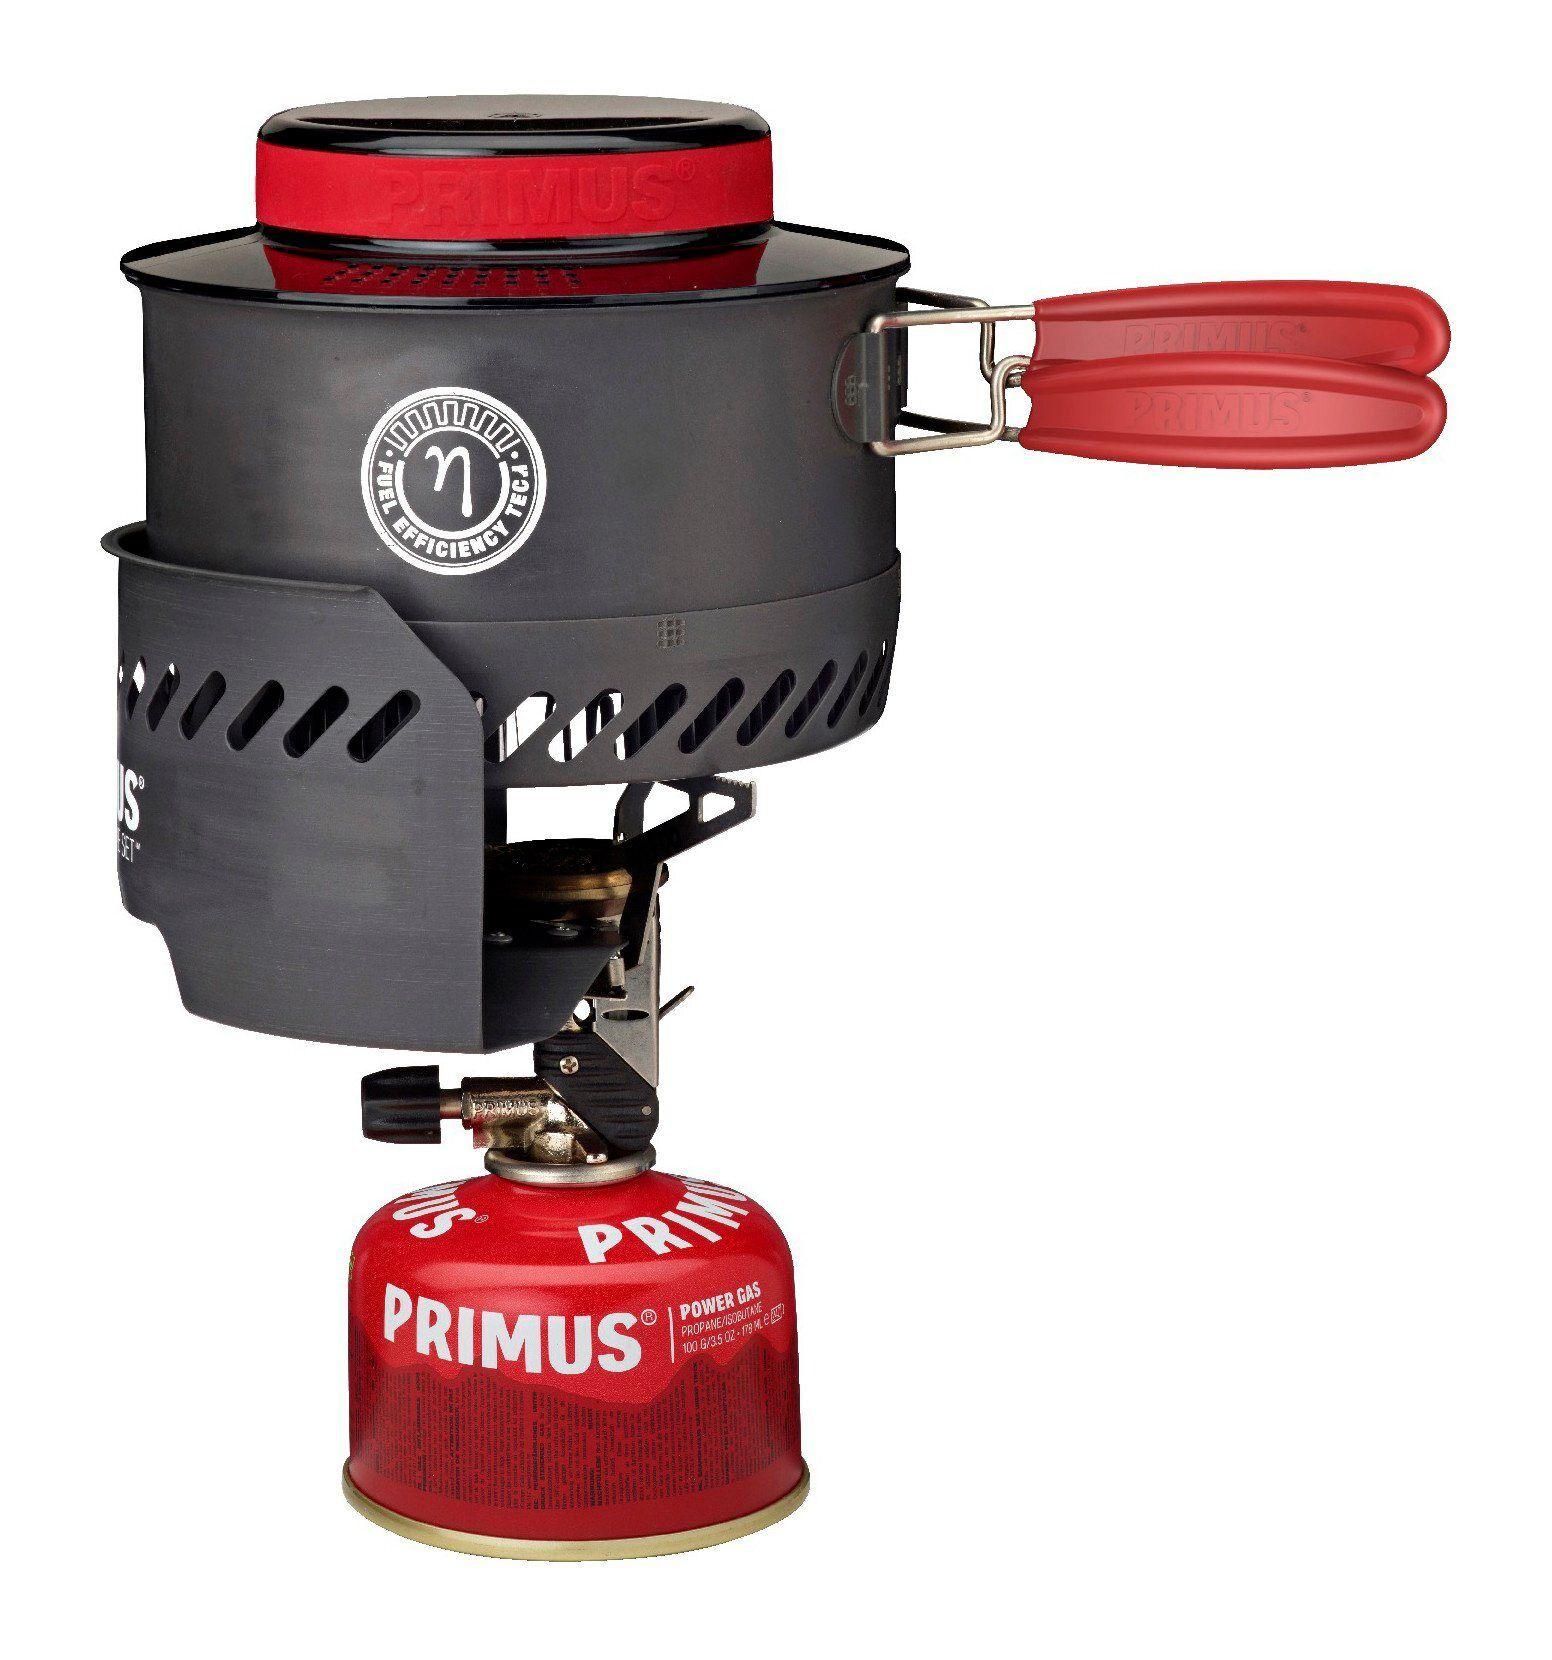 Primus Camping-Kocher »Express«, schwarz